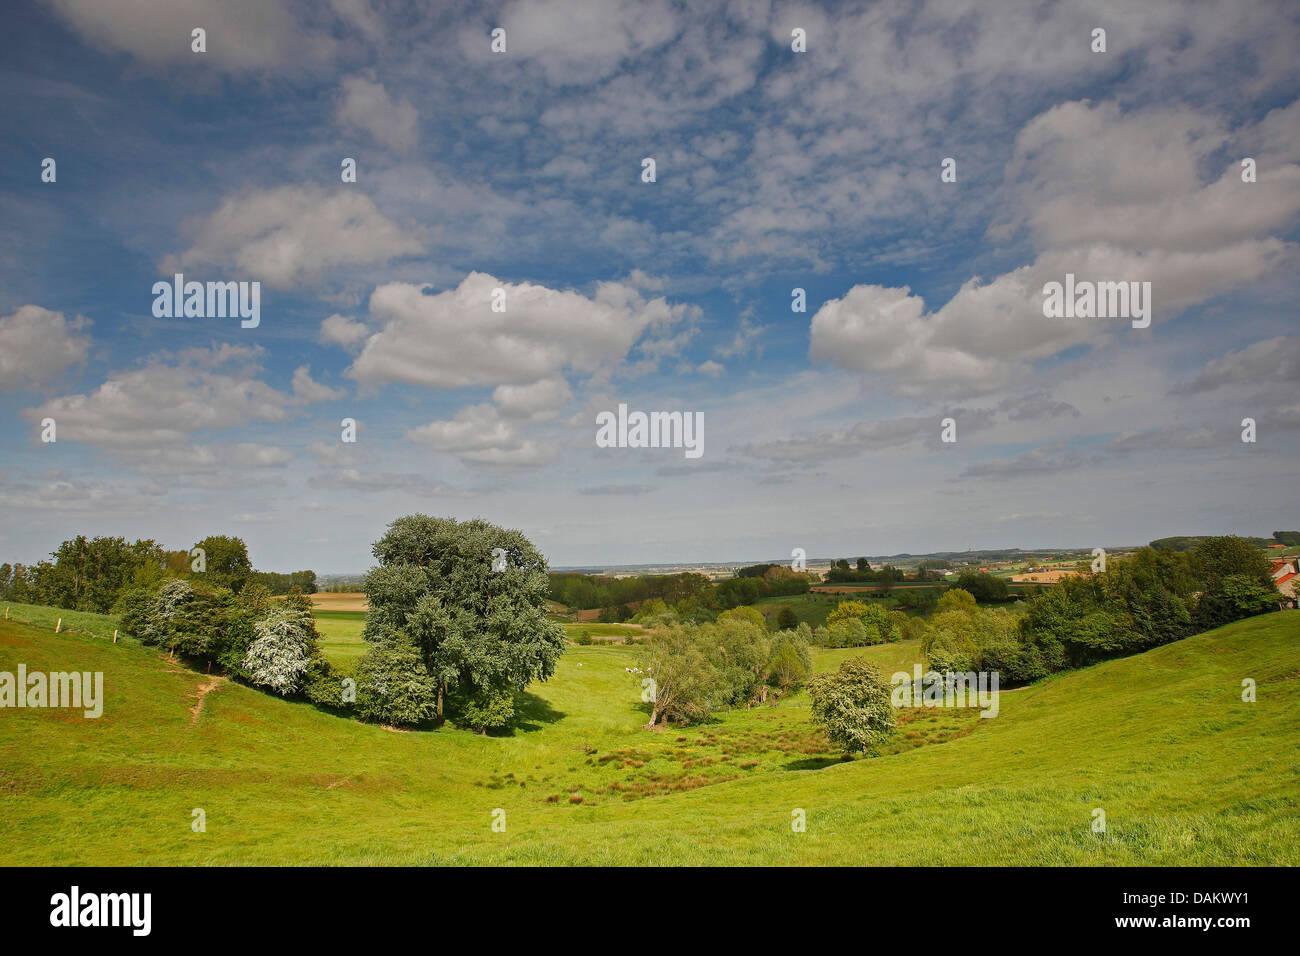 Bocage landscape with hedges and trees, Belgium, Scherpenberg - Stock Image